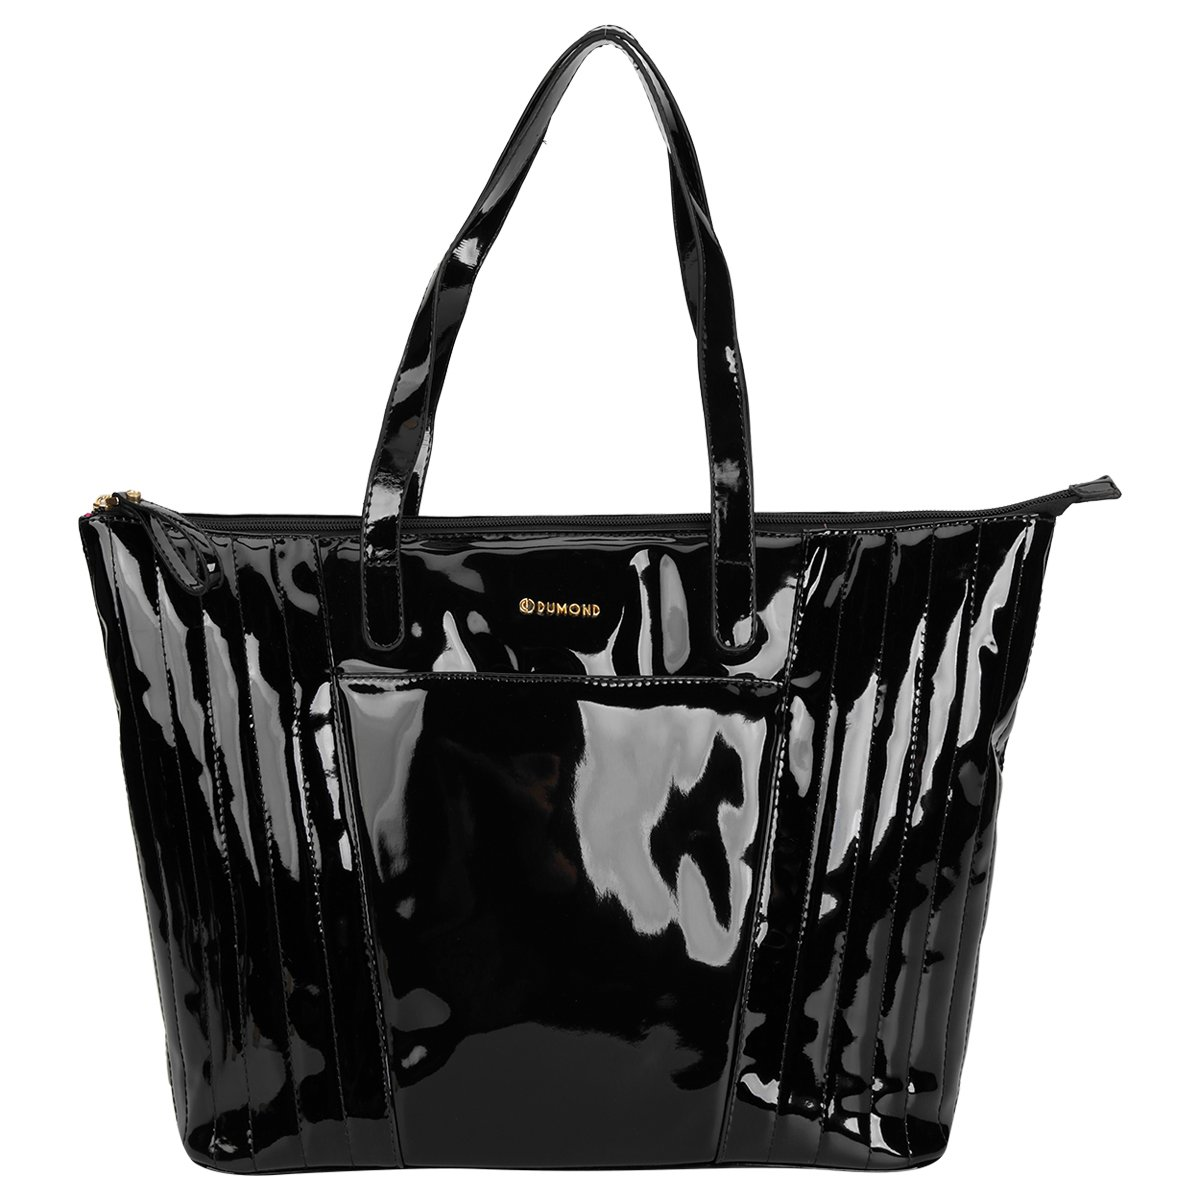 Bolsa jorge alex satchel bolso frontal : Bolsa dumond per bolso frontal preto